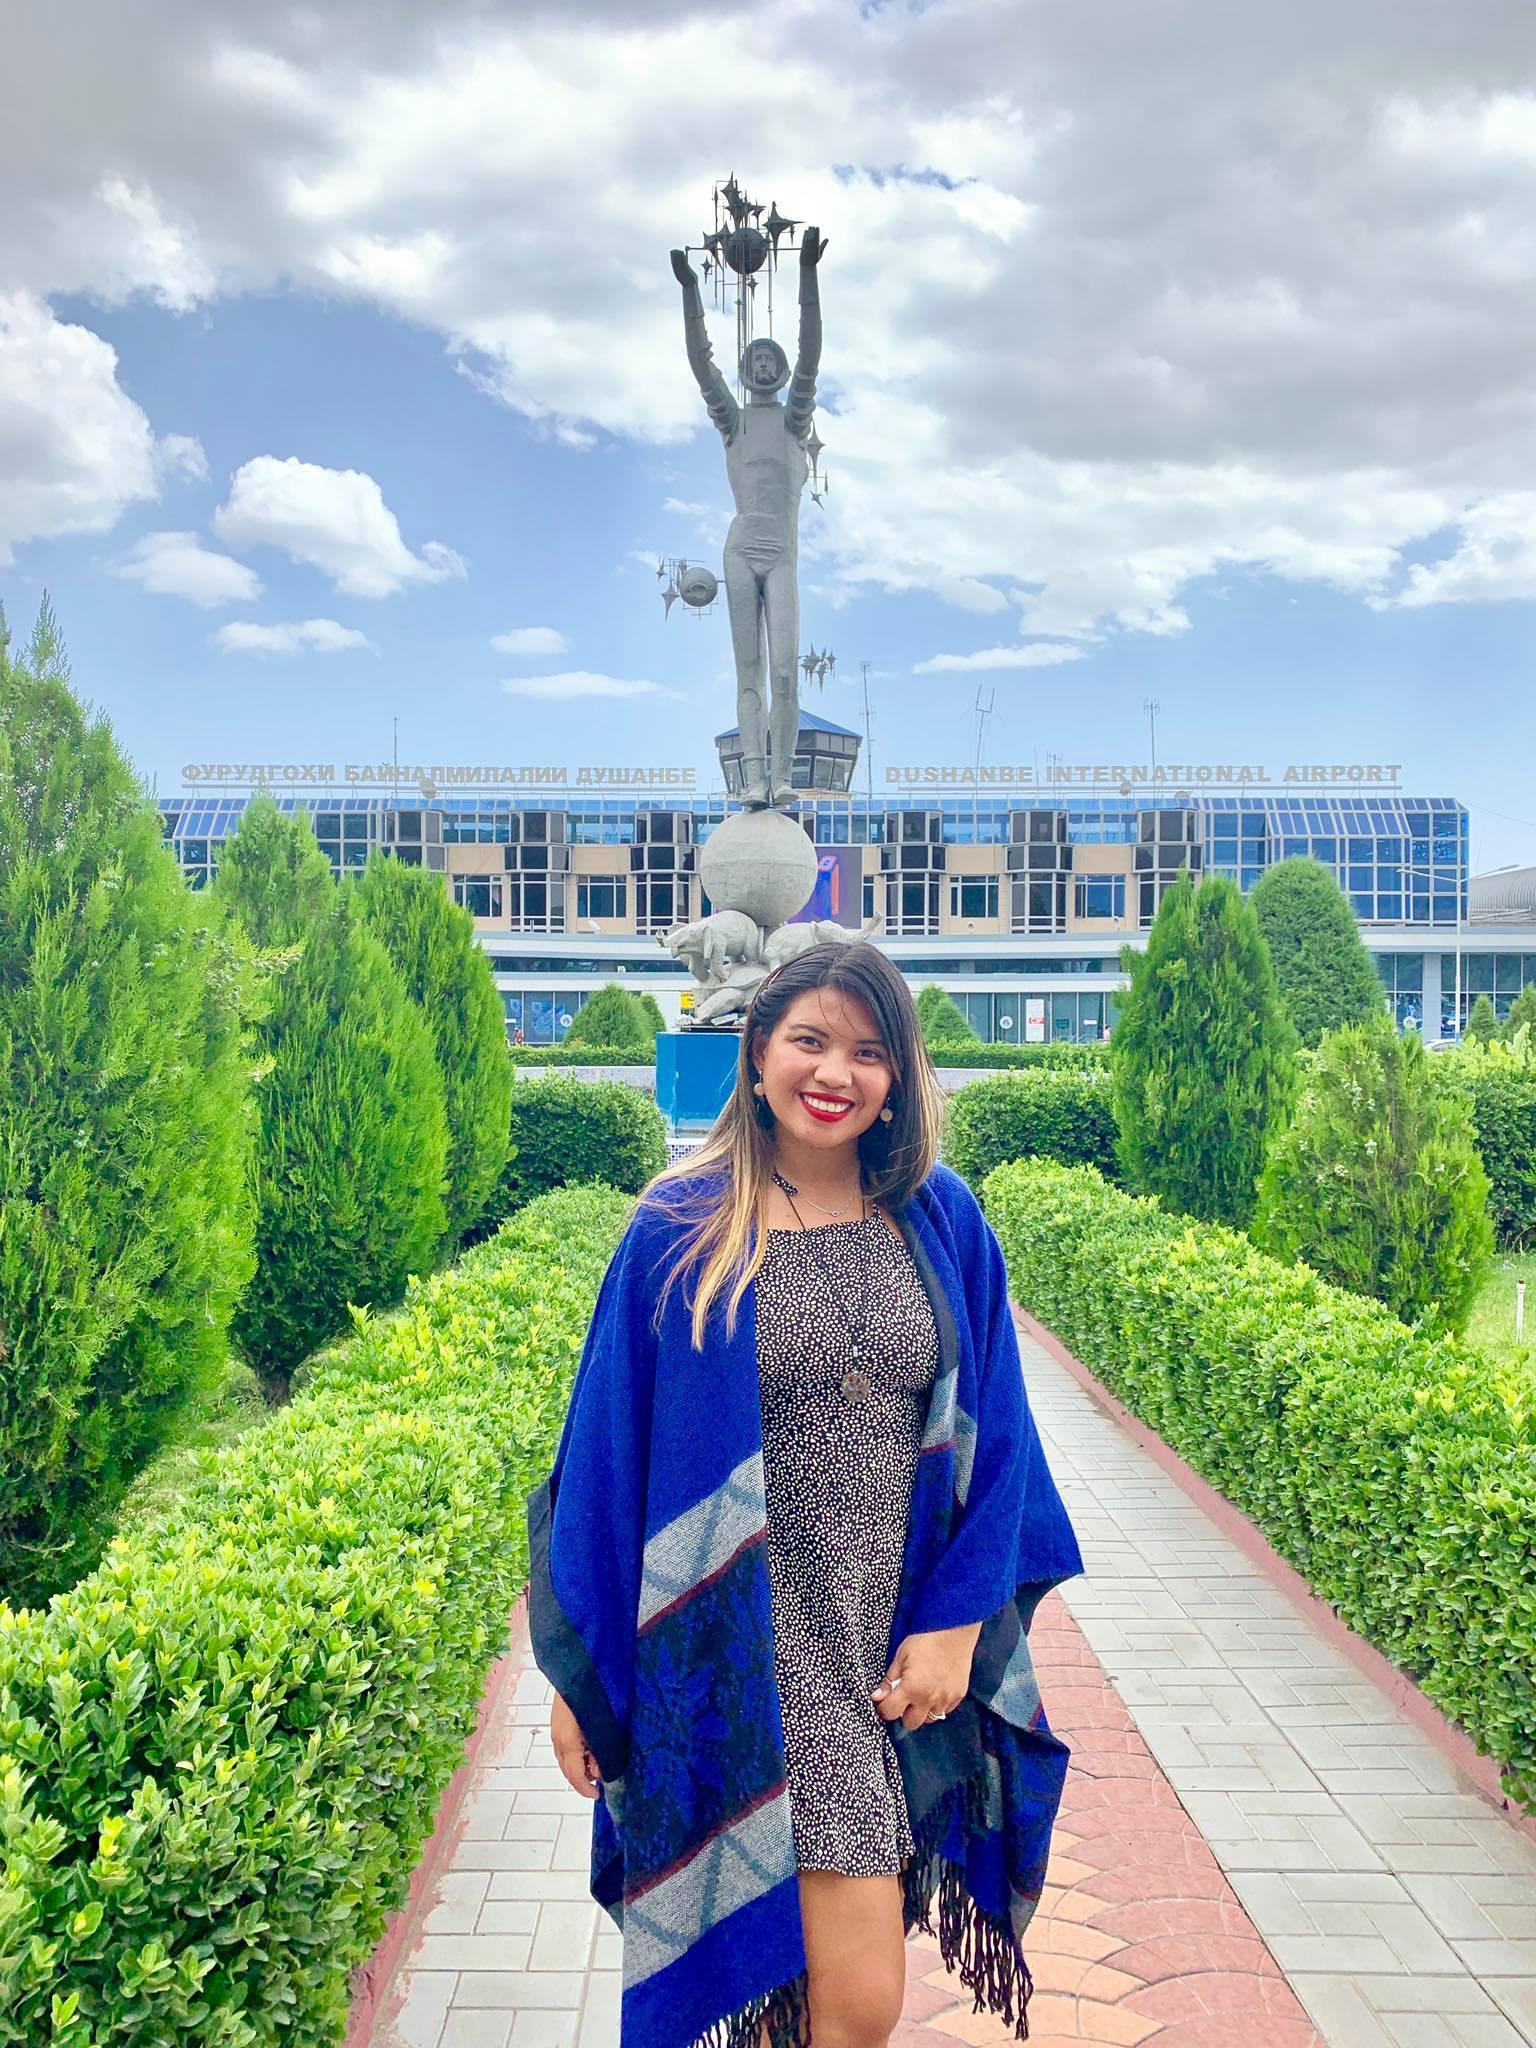 Kach Solo Travels in 2019 I just arrived in Dushanbe, Tajikistan13.jpg